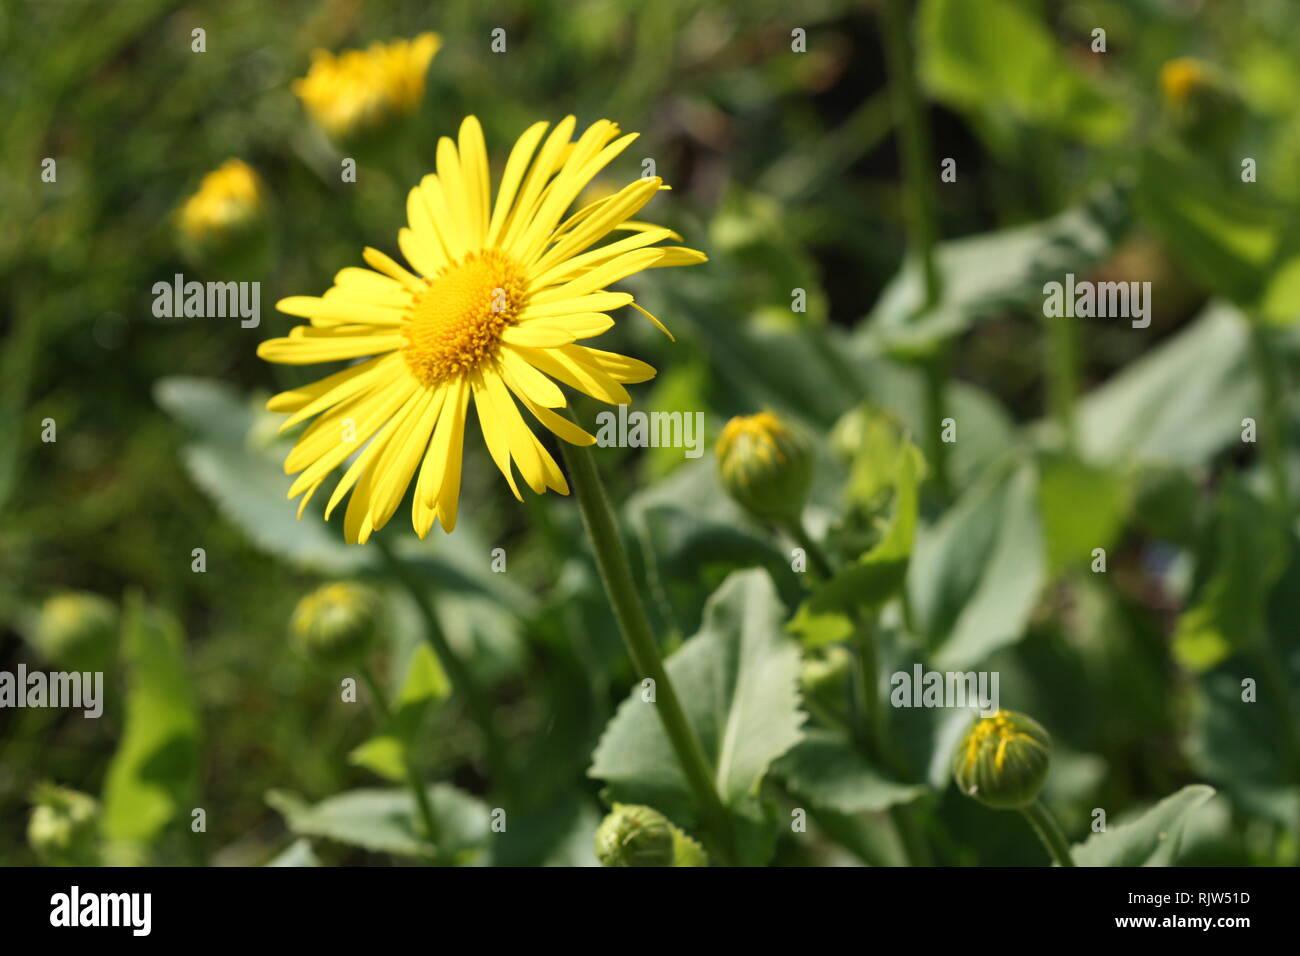 Yellow daisy flowers Stock Photo